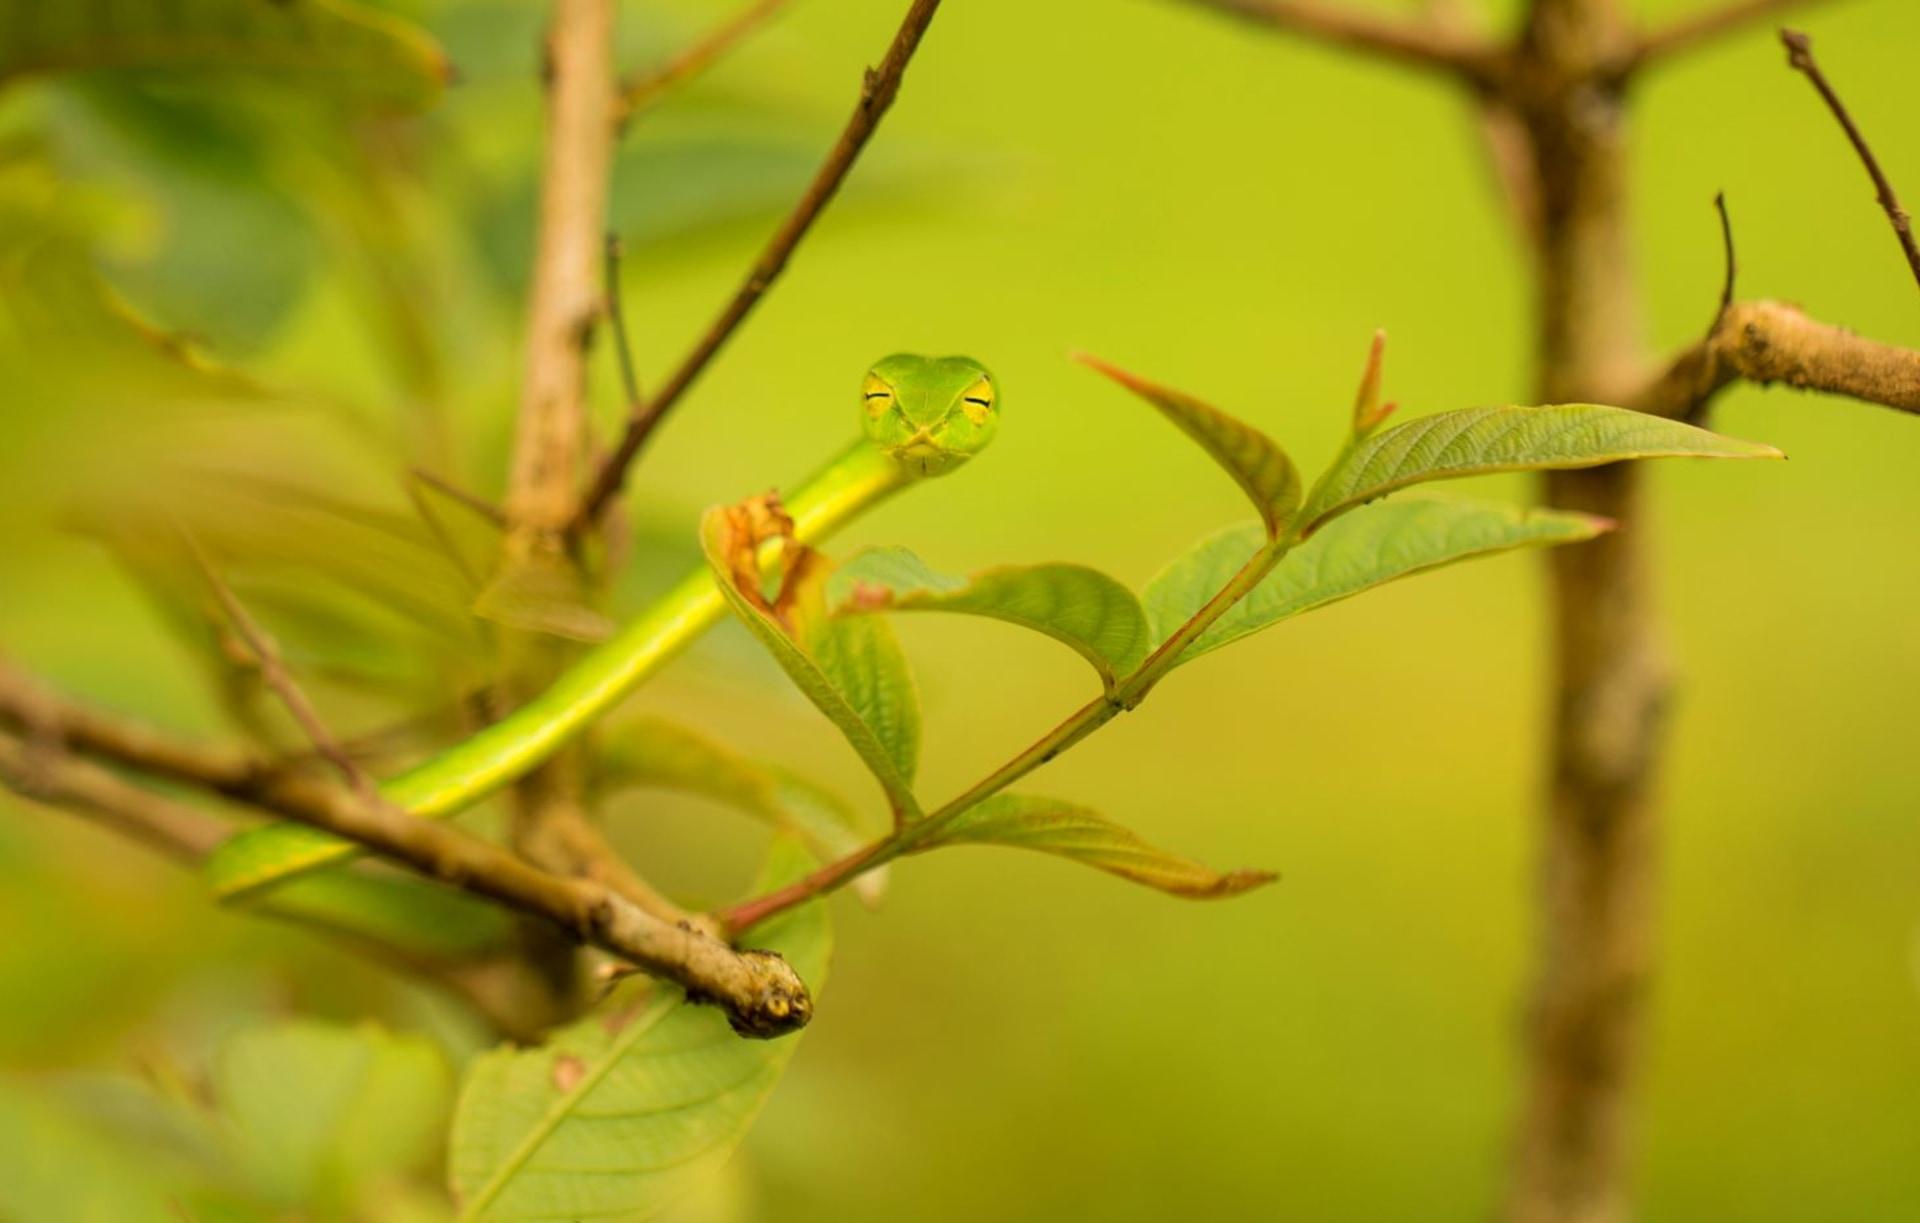 Leaf Masquerade of the Green Vine Snake